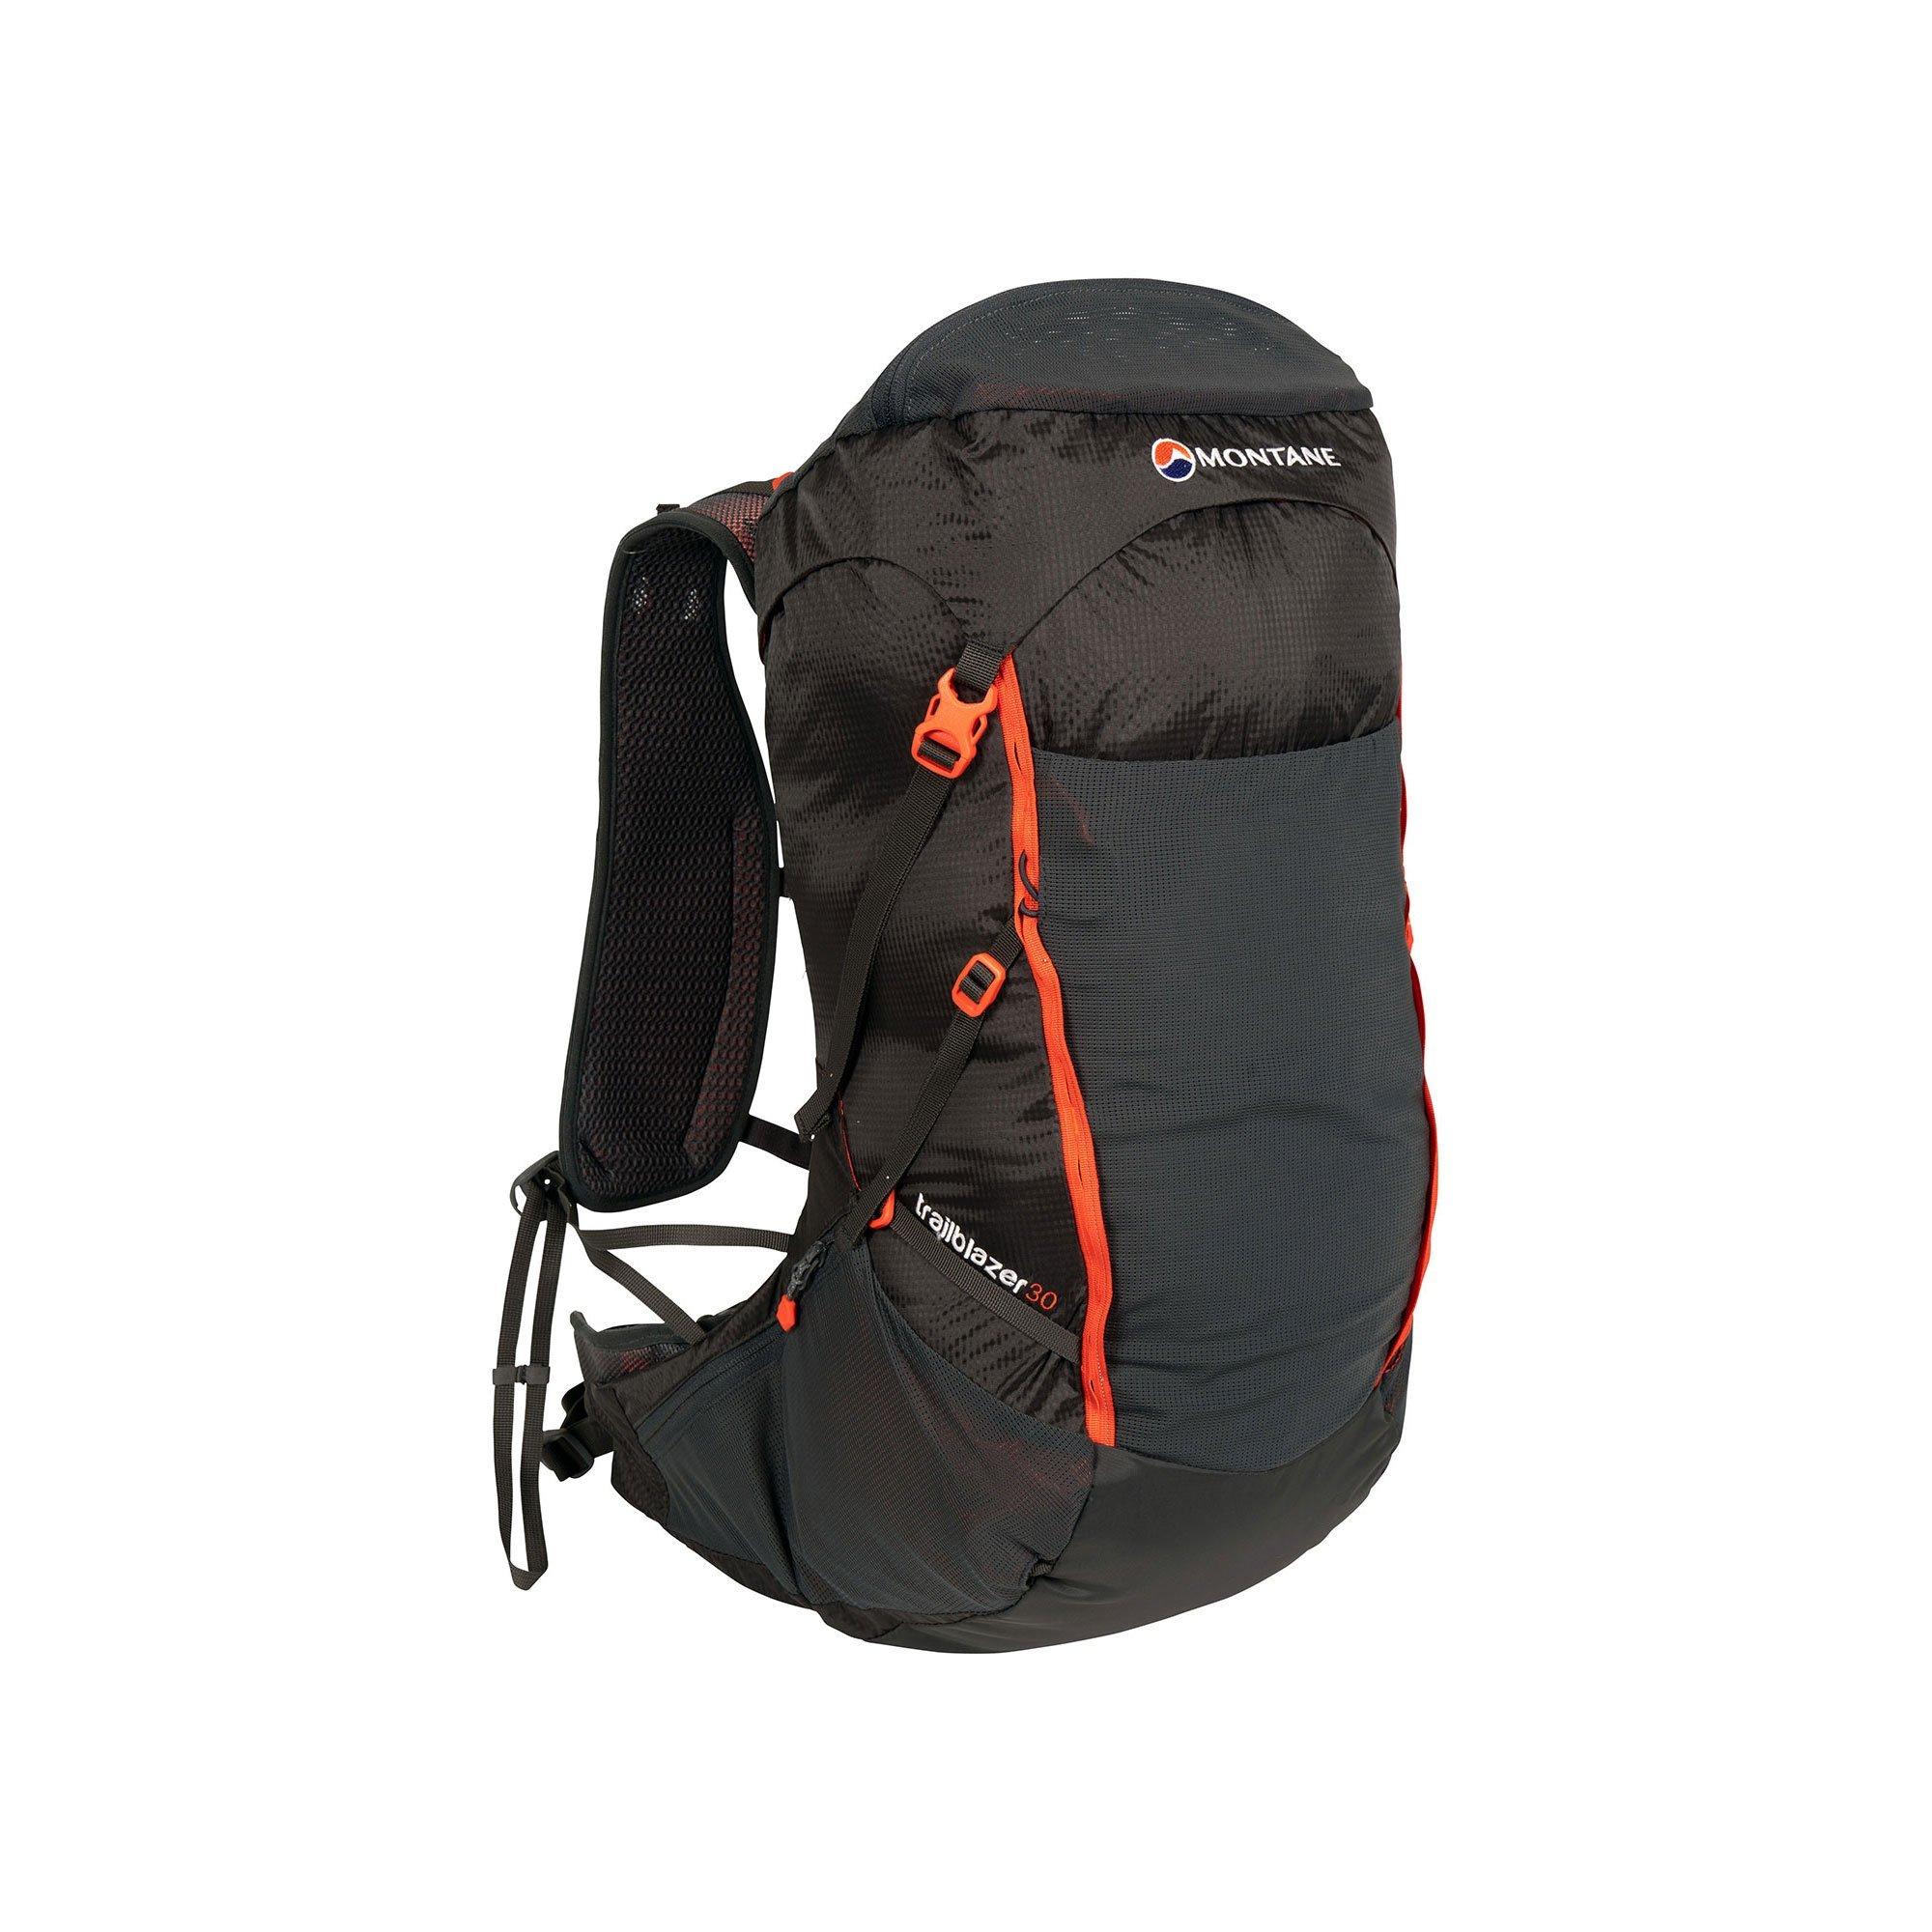 Montane Trailblazer 30